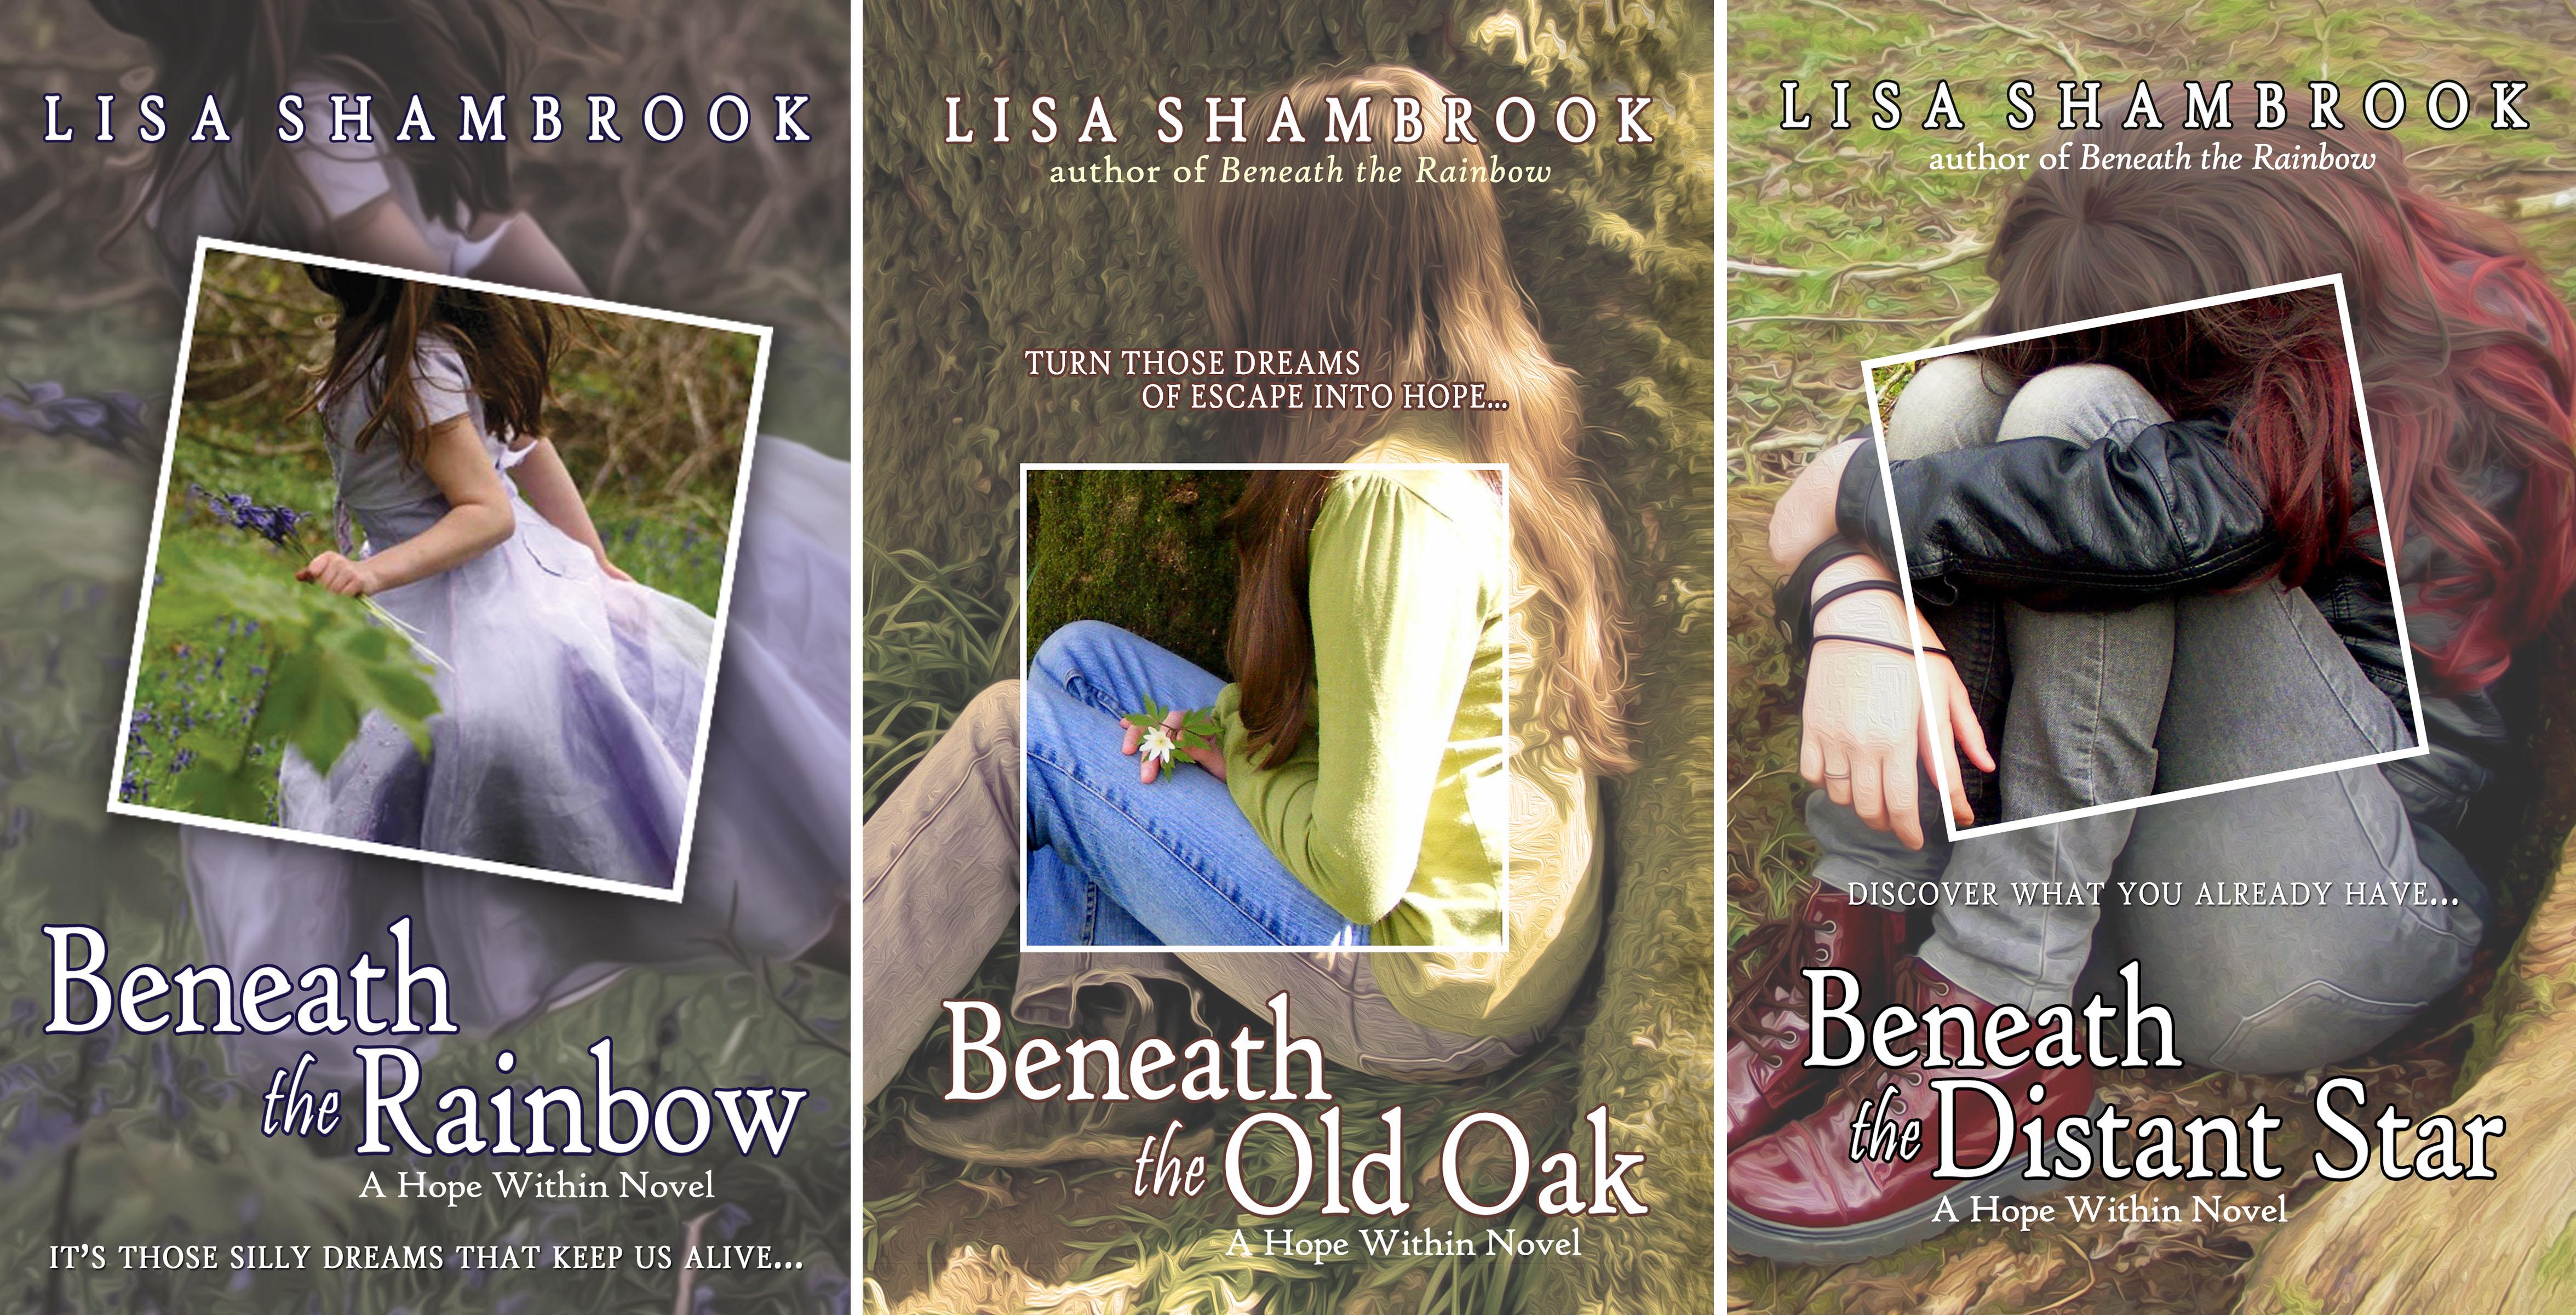 L_Shambrook_The_Hope_Within_Novels